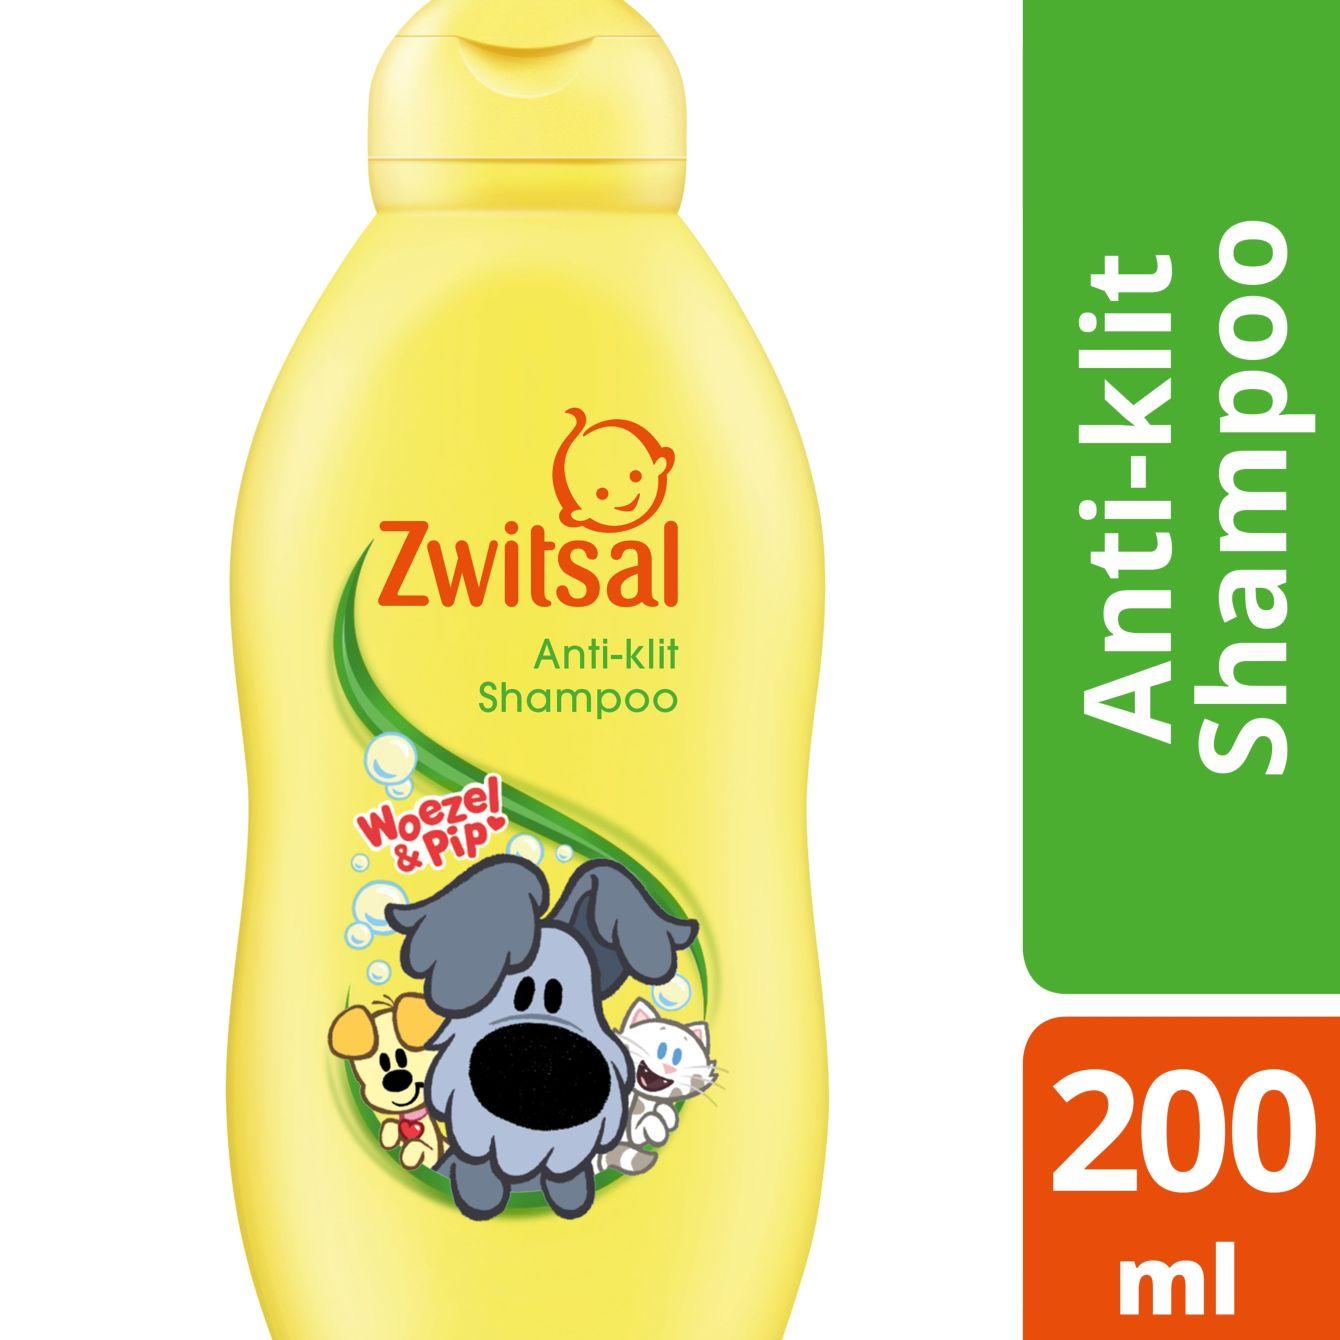 Zwitsal  Woezel & Pip Anti-klit Shampoo